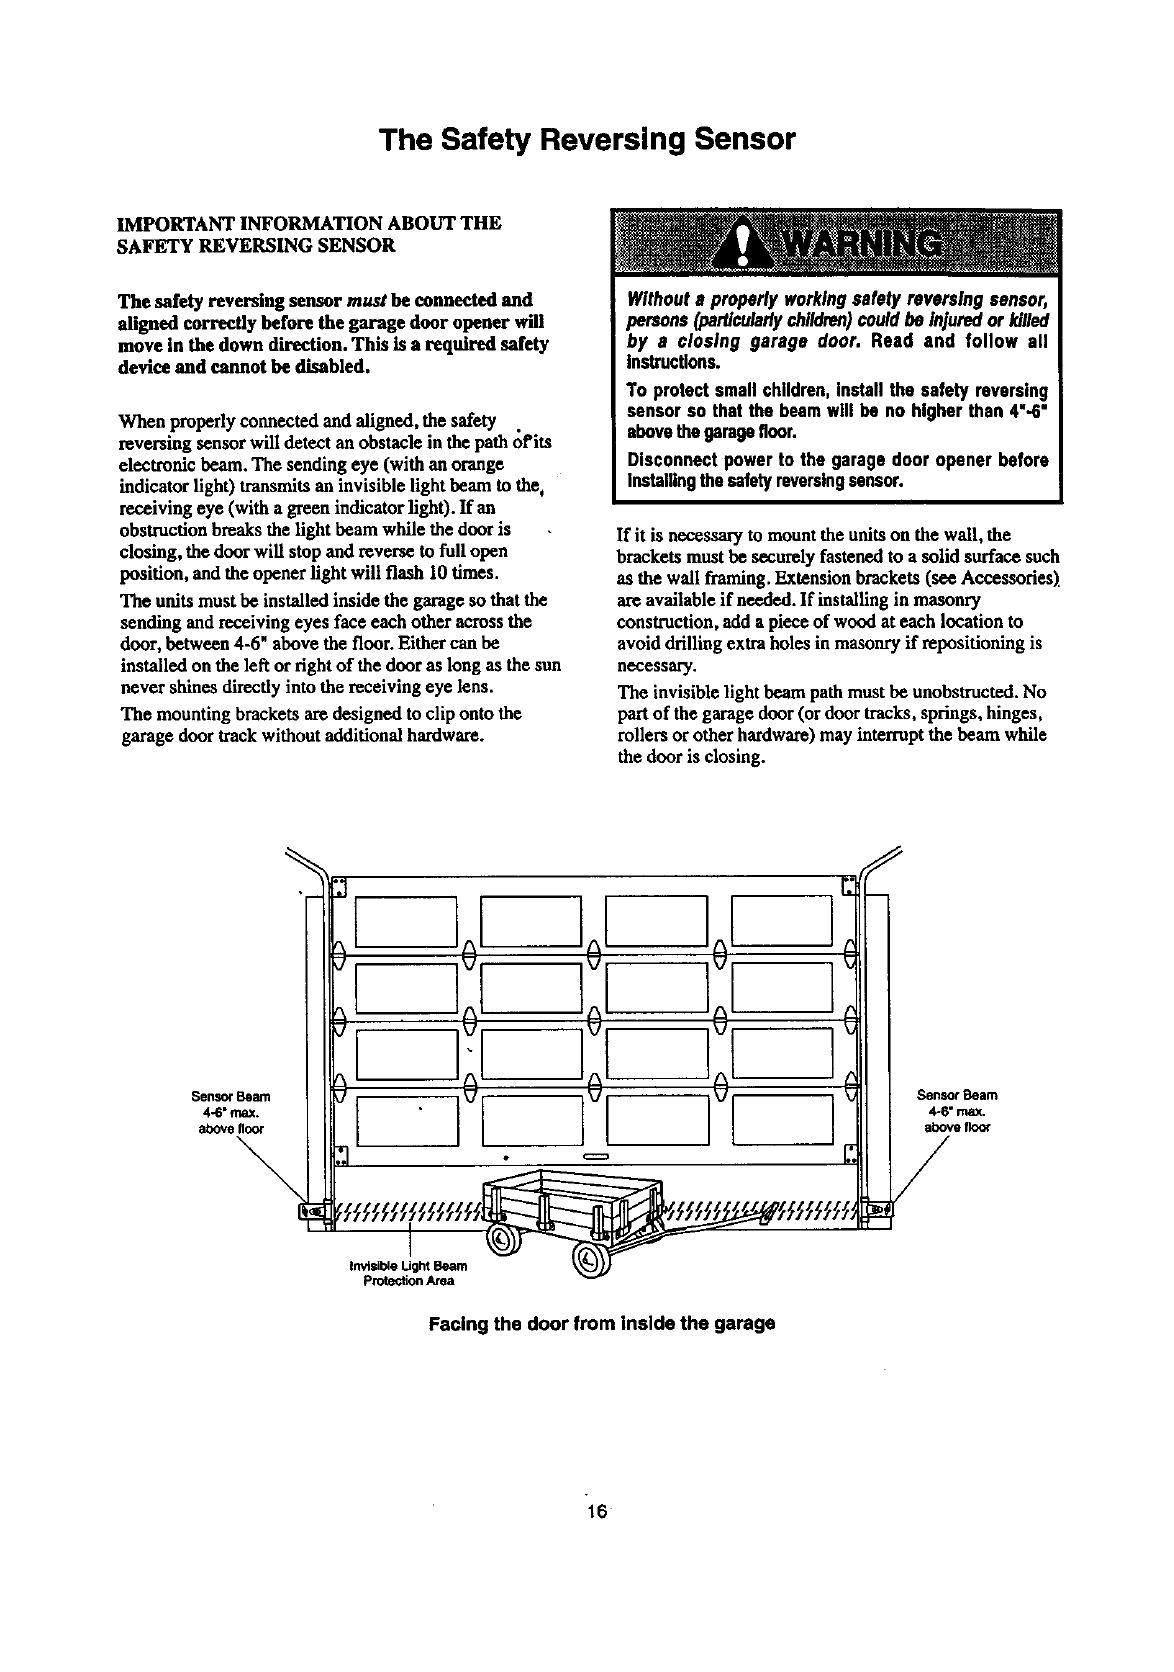 Craftsman 13953963srt User Manual Garage Door Opener Manuals And Safety Reversing Sensor Wiring Diagram Guides L9060009